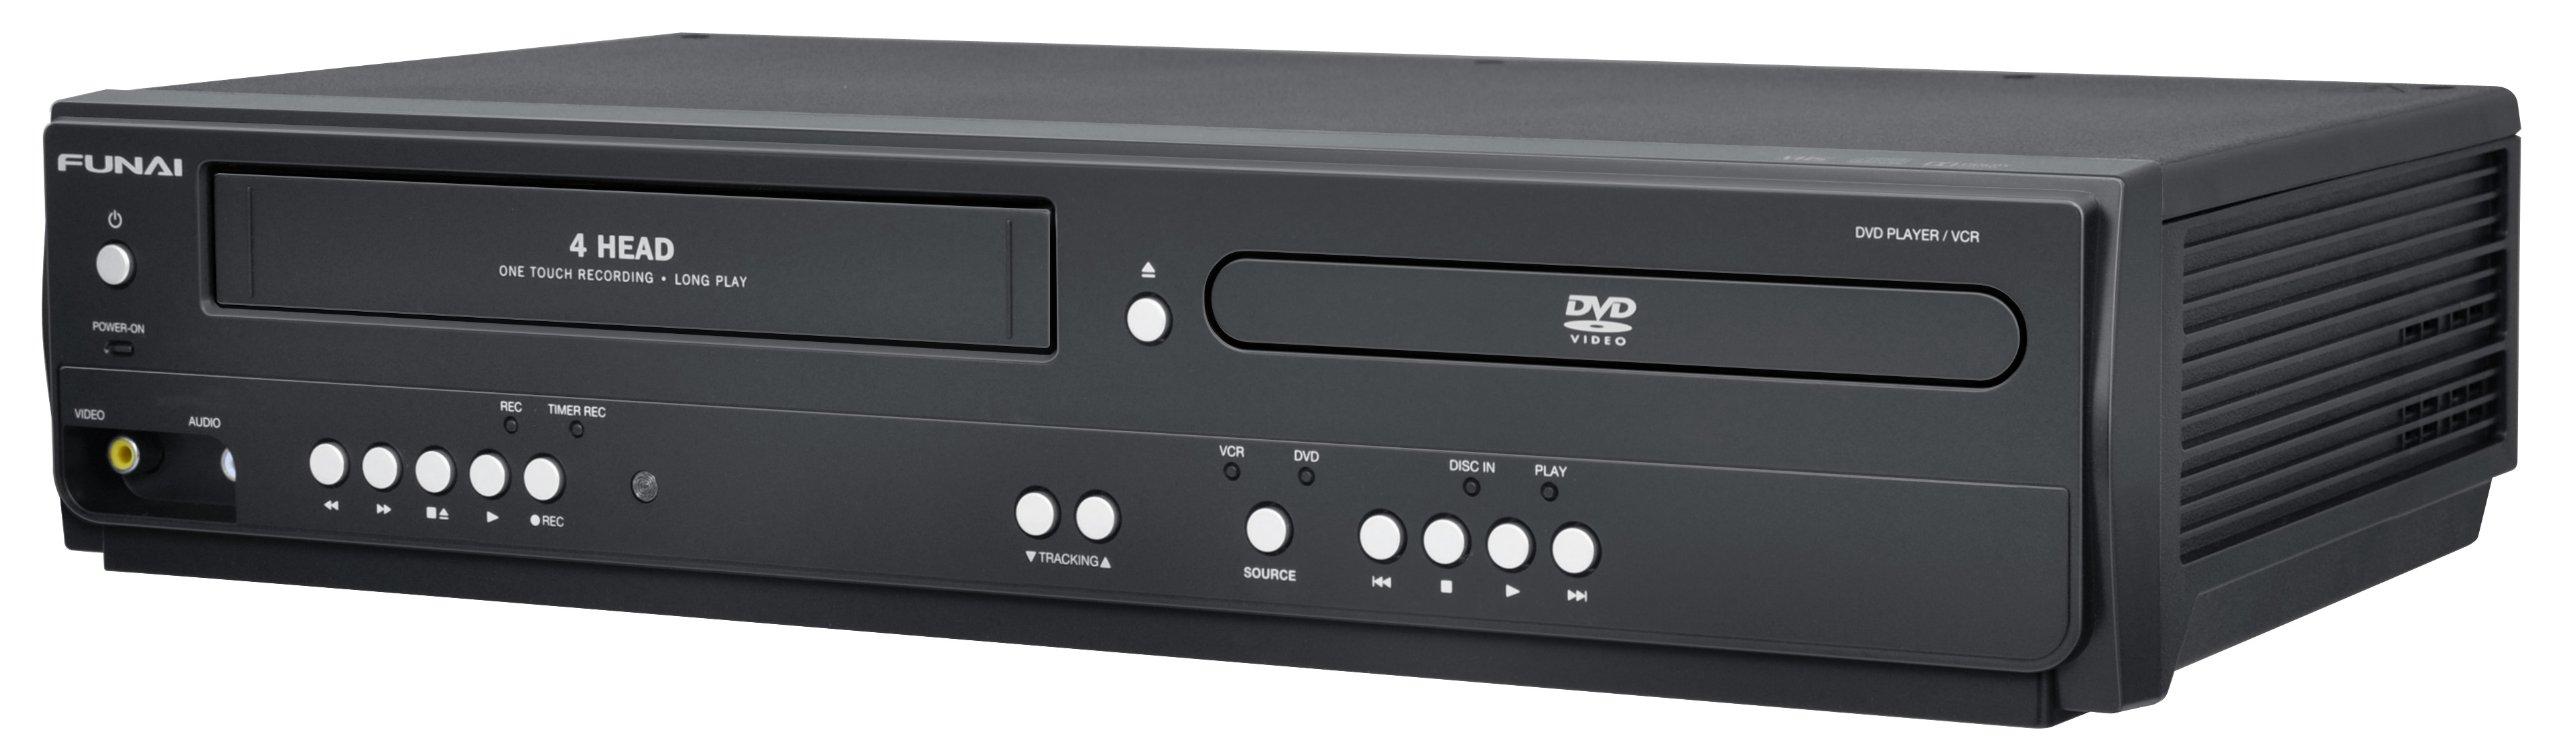 Funai Corp. DV220FX4 Combination Video and DVD Player (2014 Model) by Funai